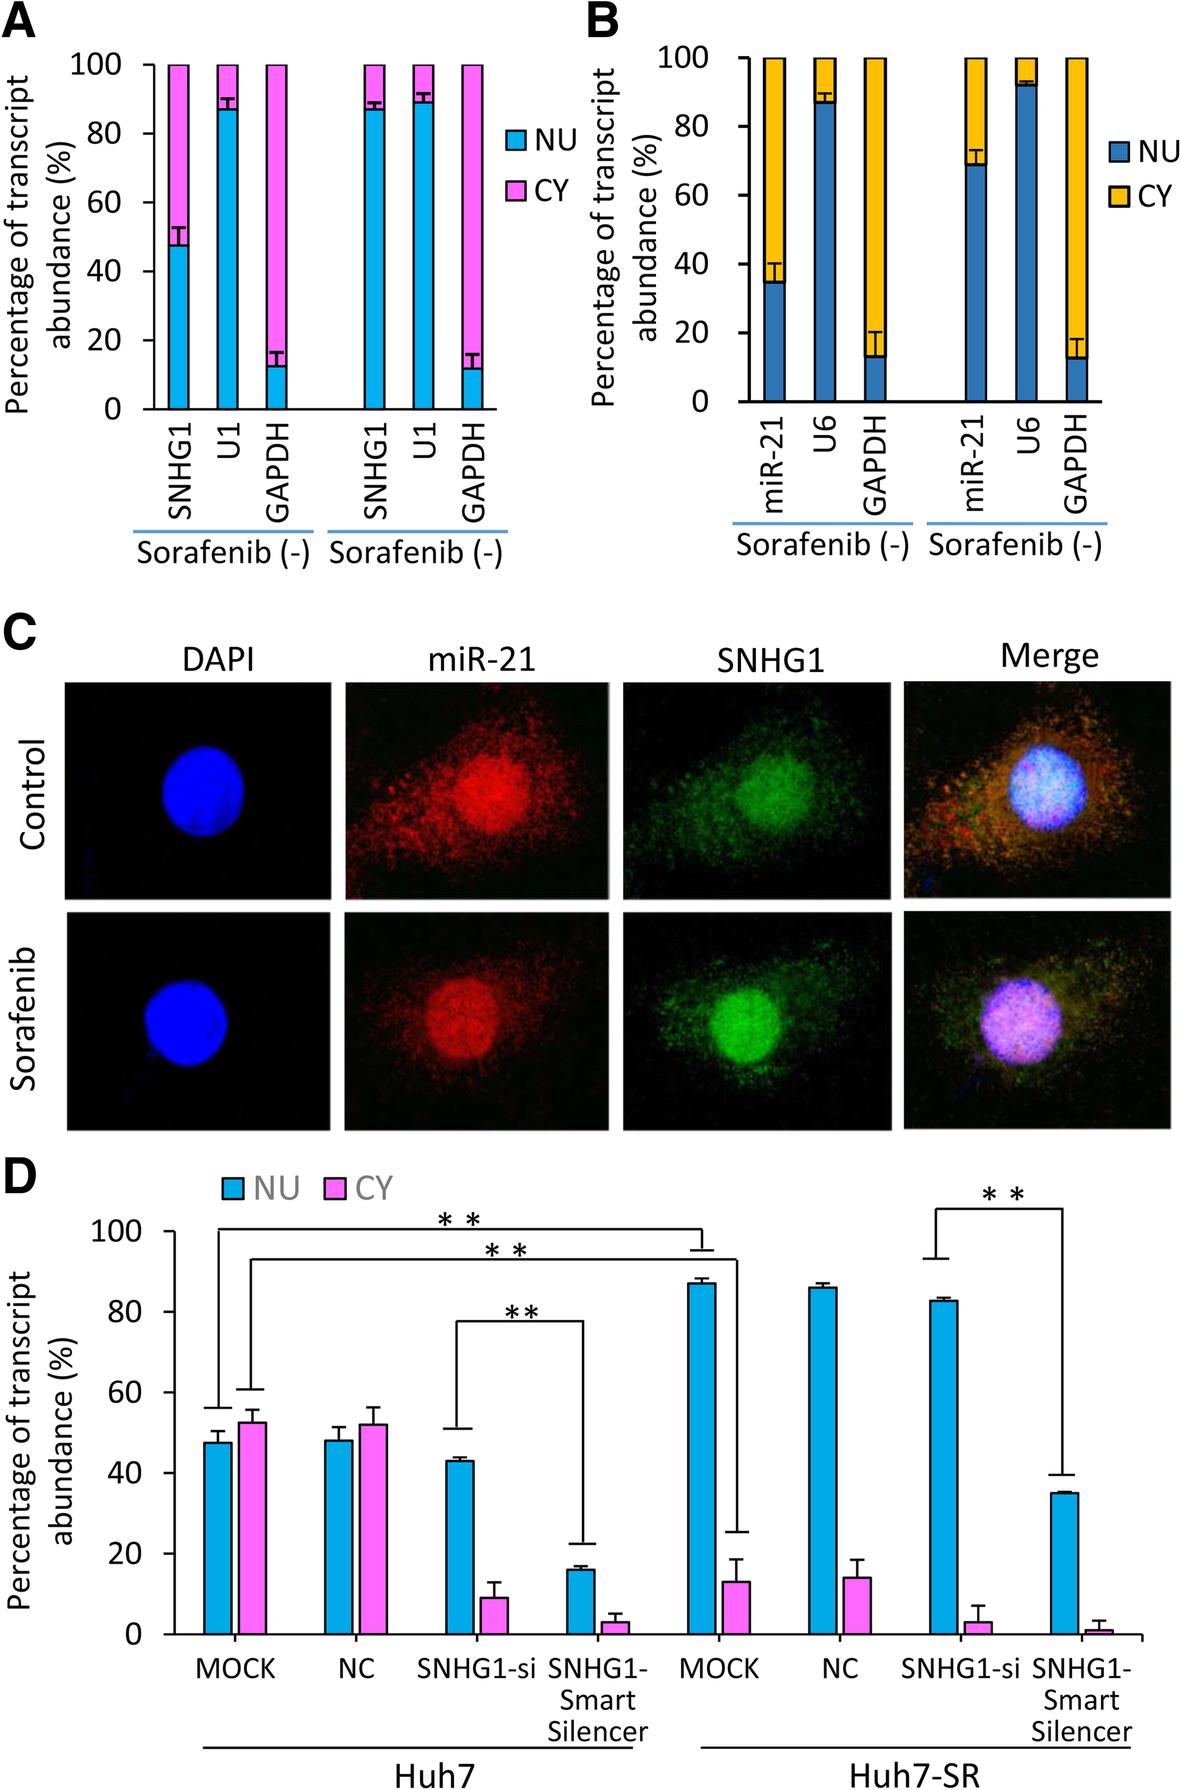 LncRNA SNHG1 contributes to sorafenib resistance by